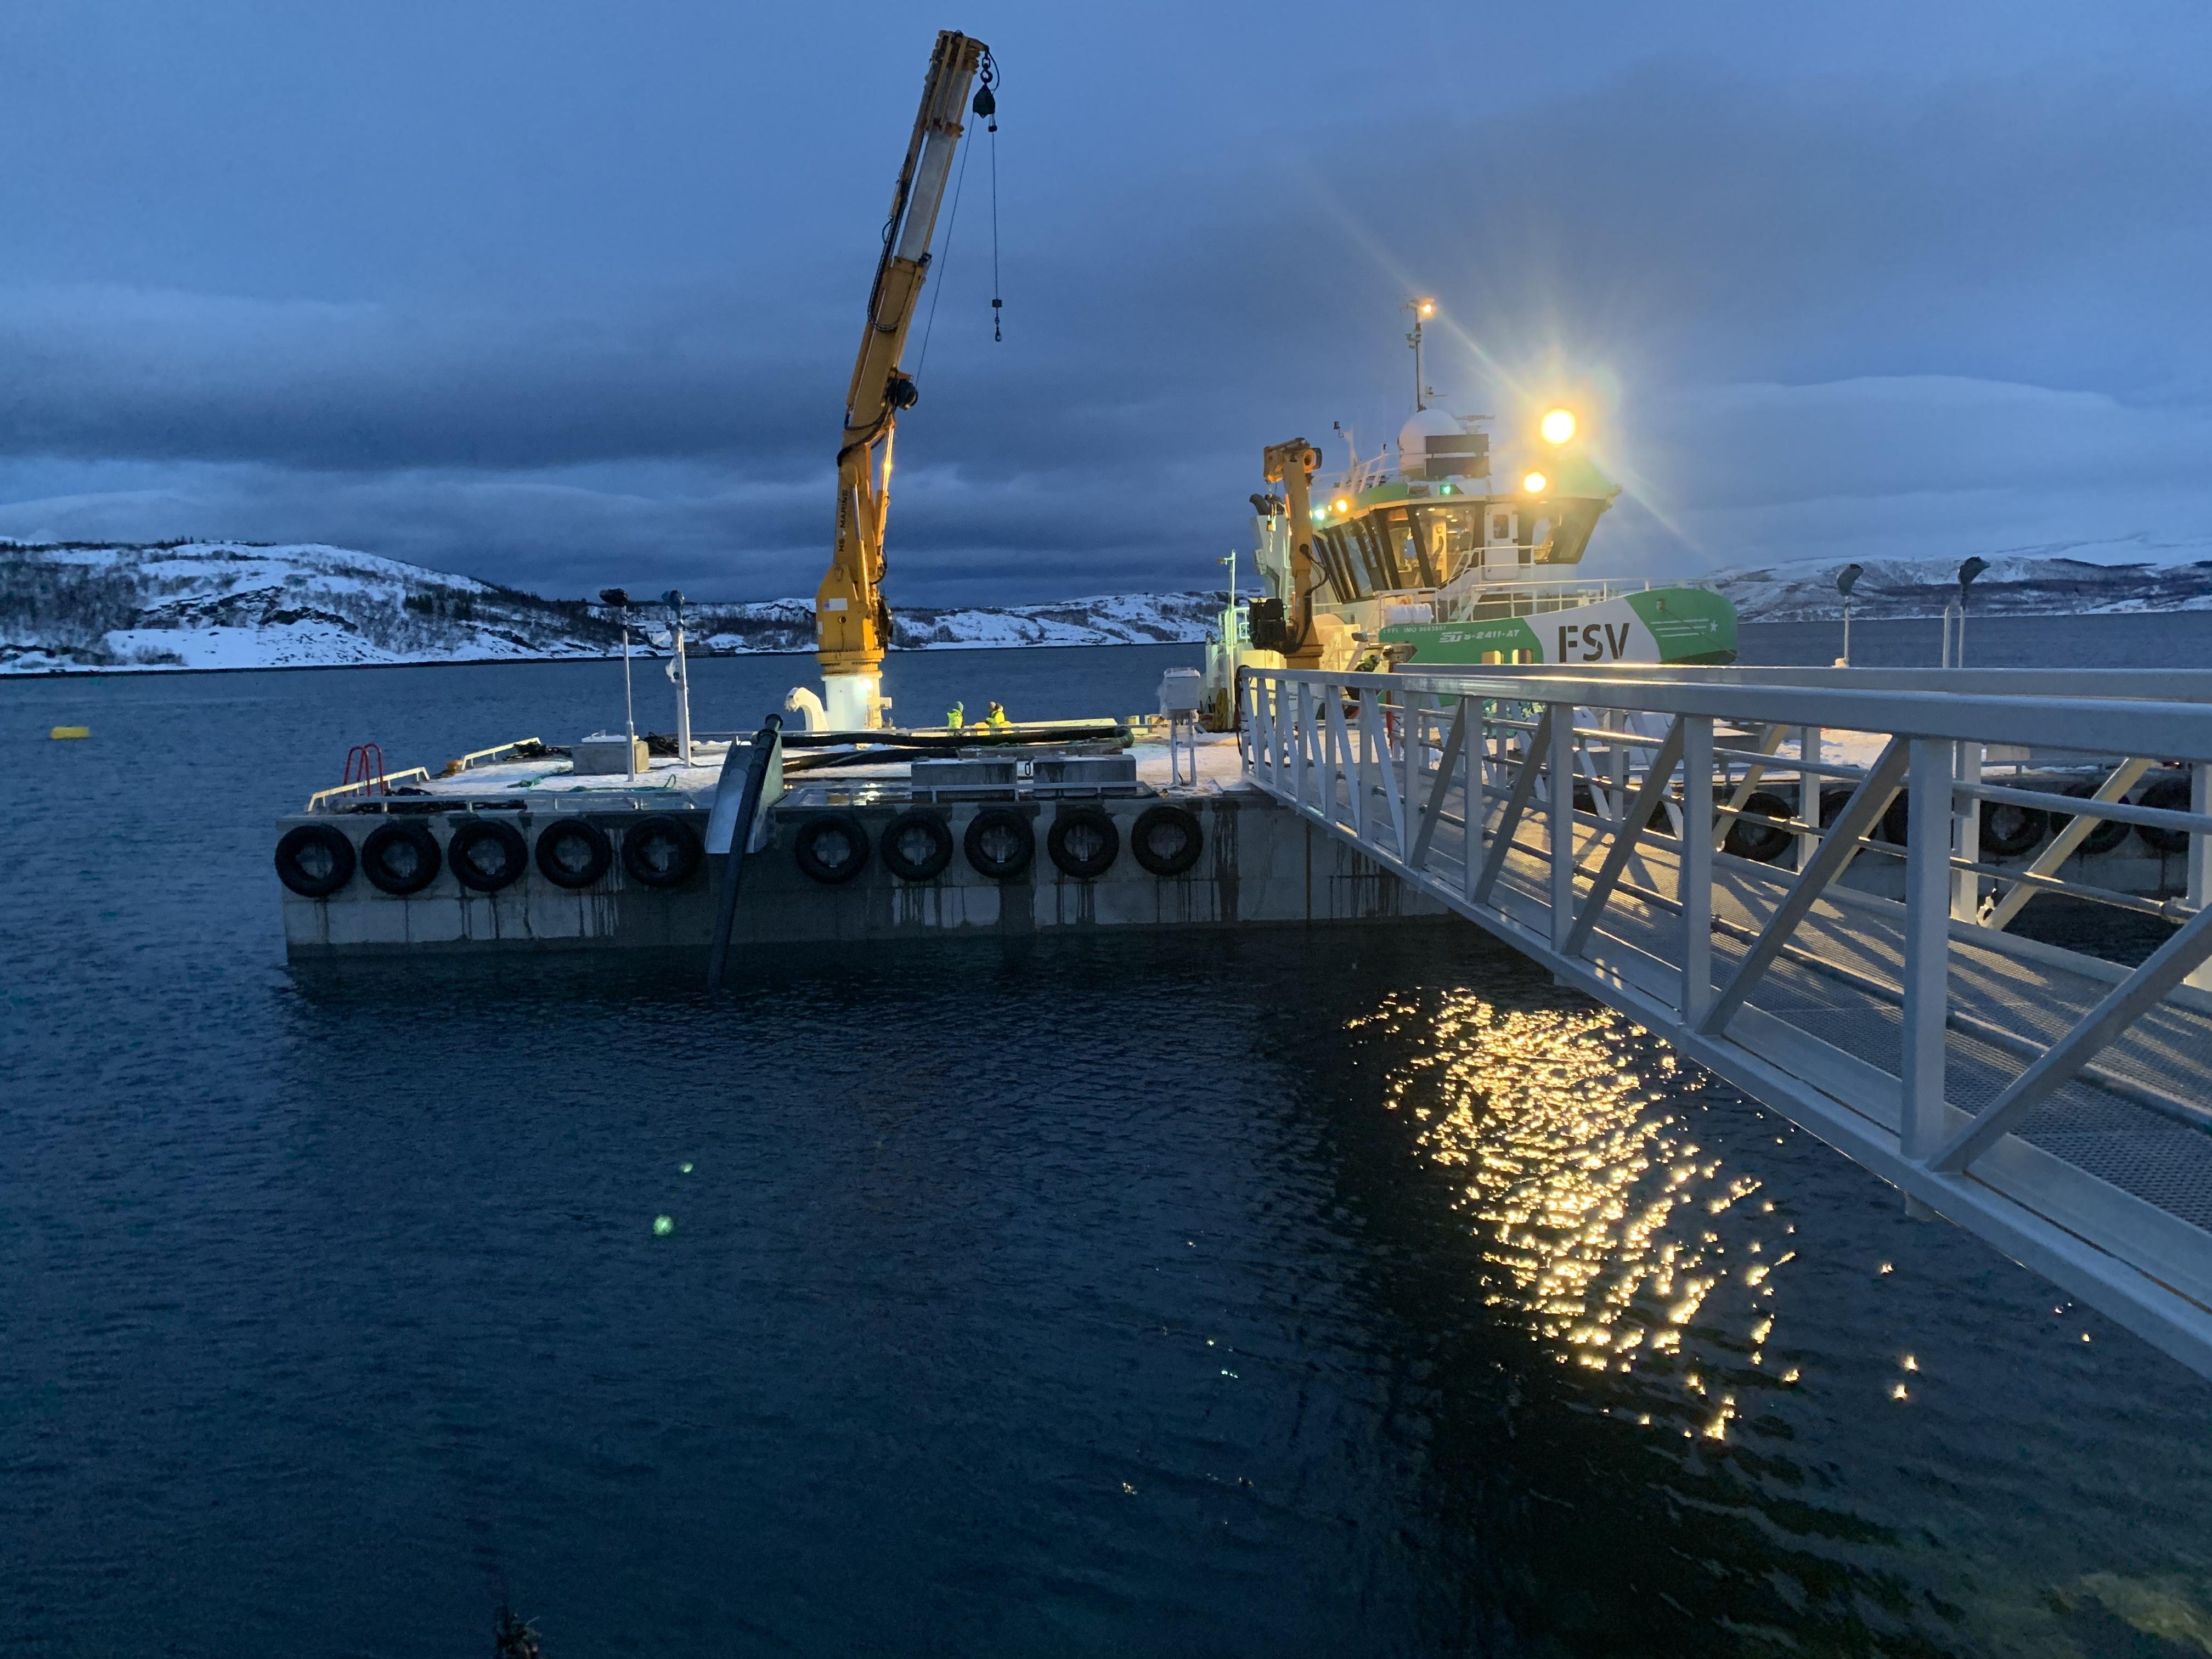 https://marinasolutions.no/uploads/2019-12-13-Installasjon-Friarfjorden-Foto-JVB-13.jpg